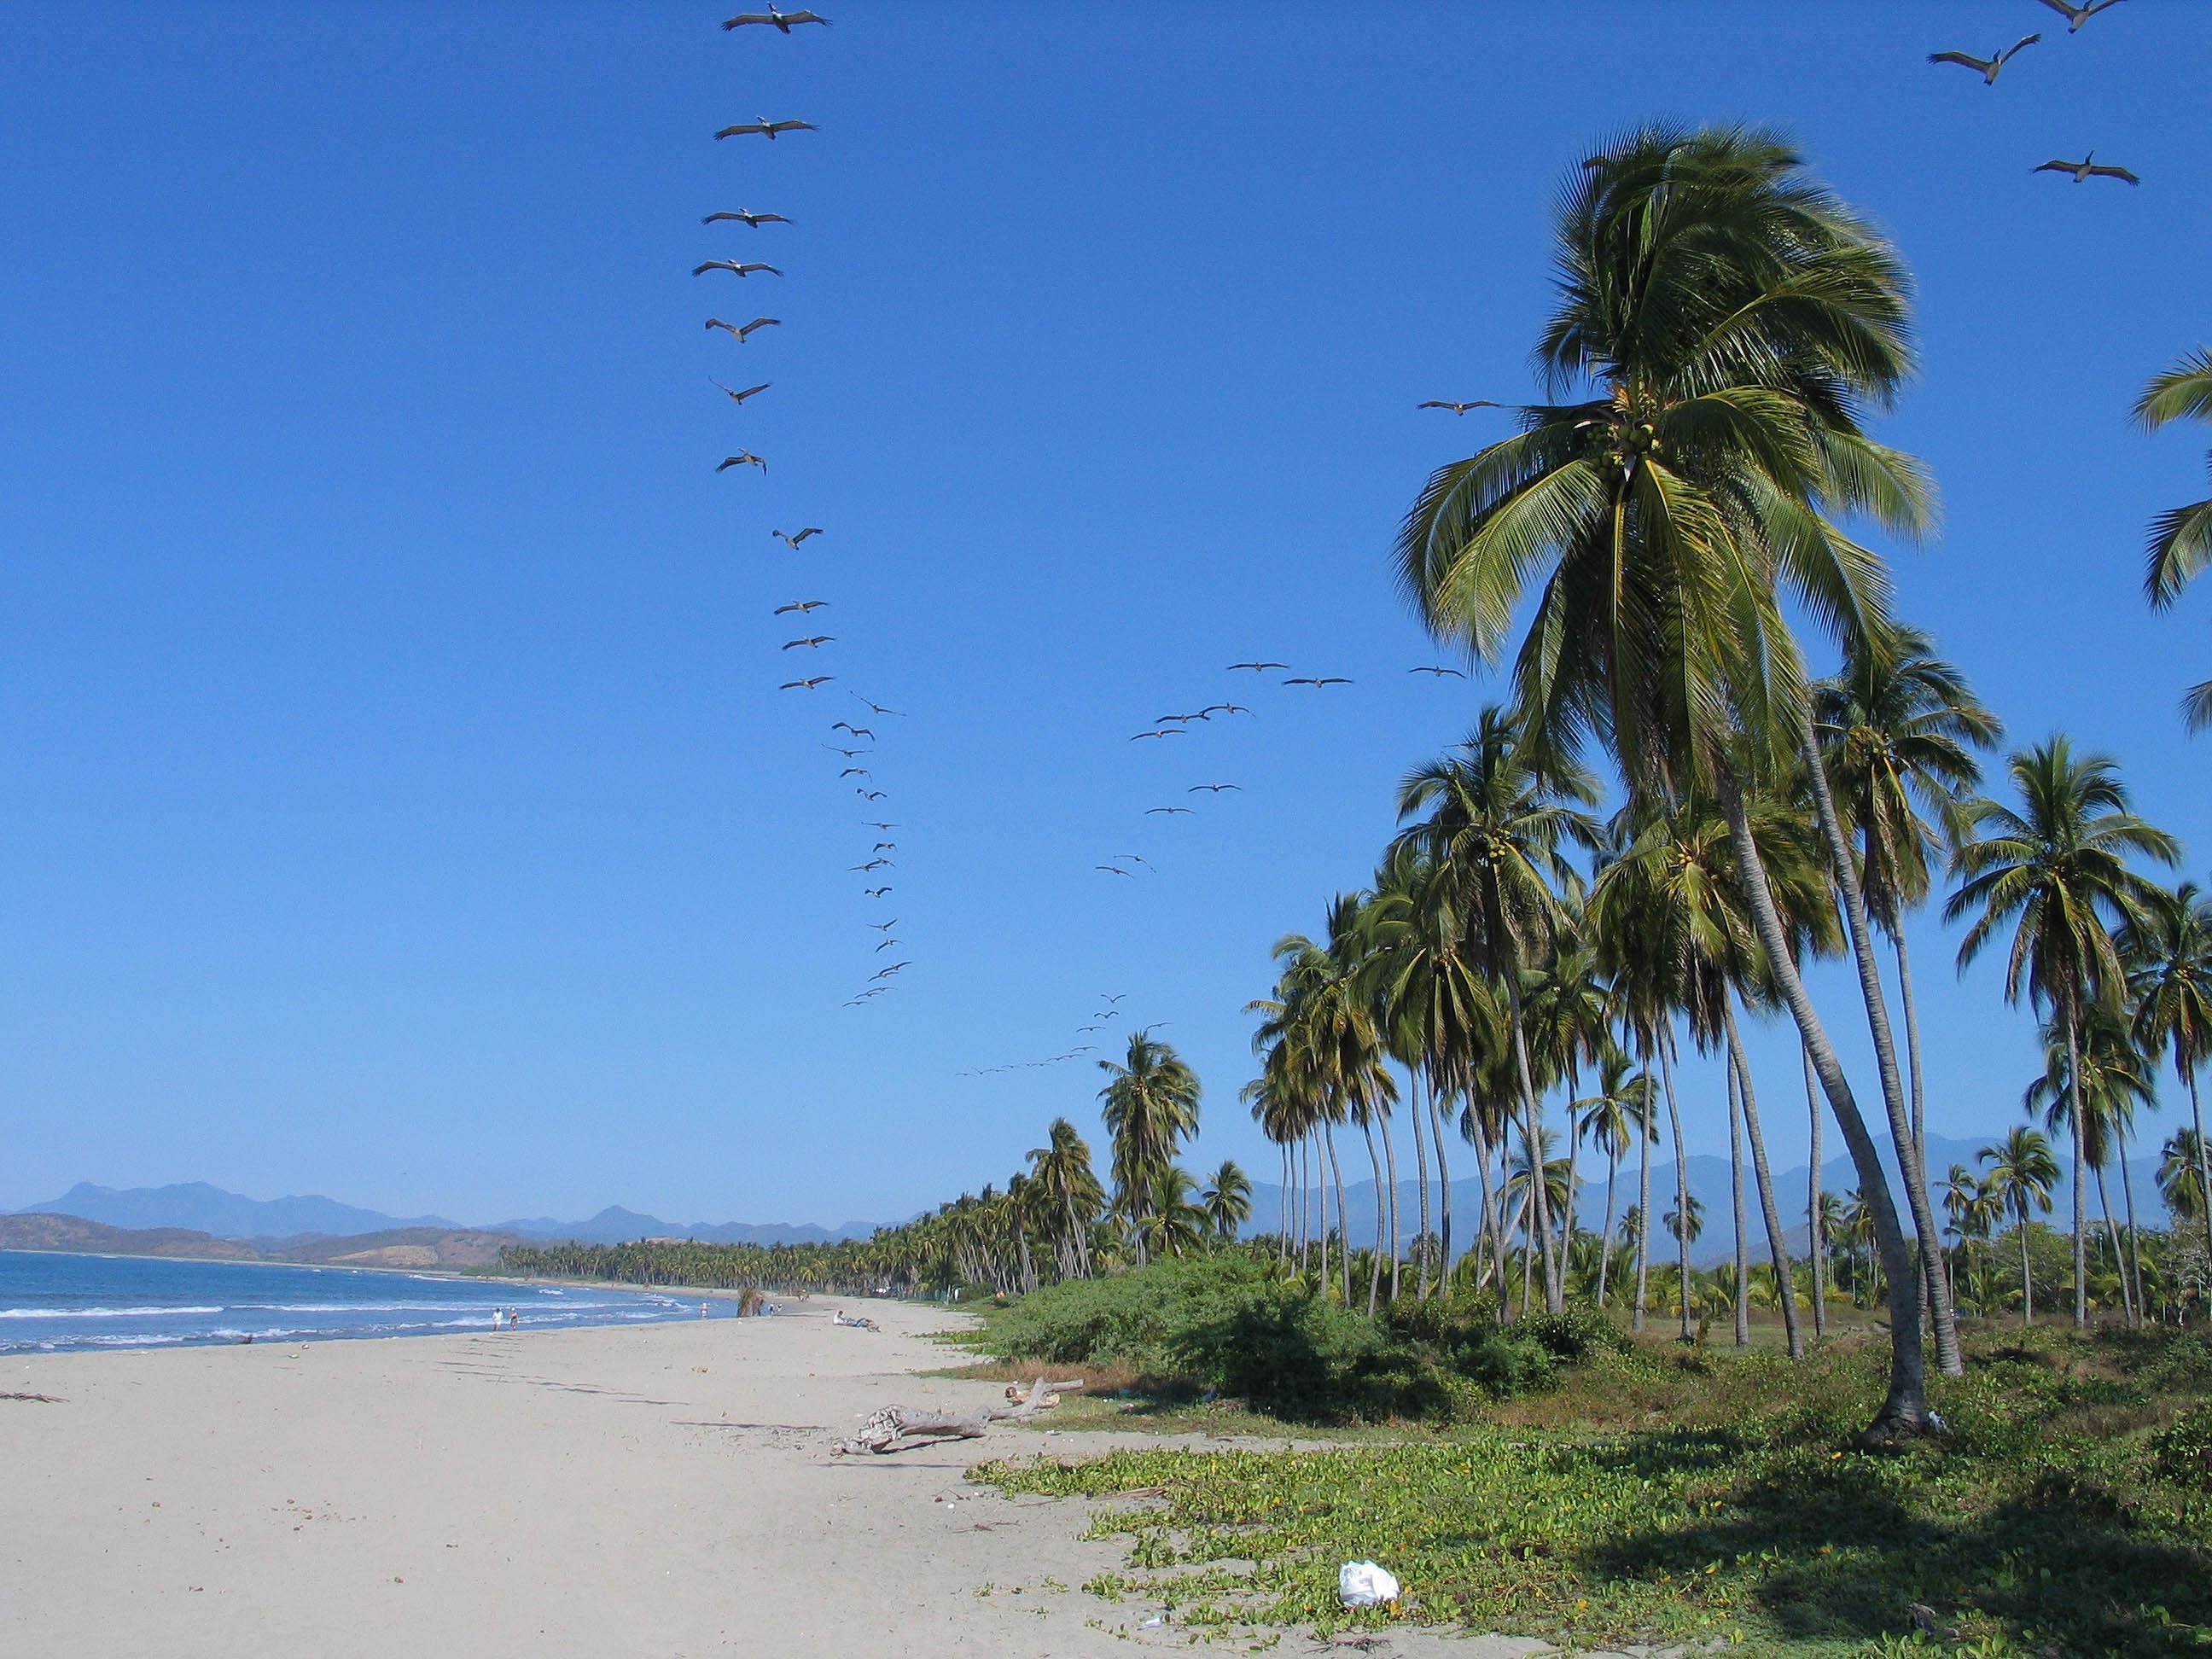 Description 20050103-Ixtapa Playa Linda.jpg